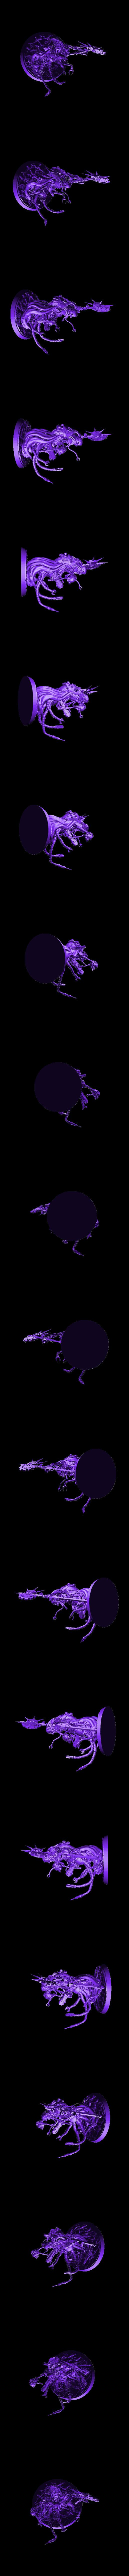 Exospectre_Omnissian_Axe_ver9.9.stl Download free STL file Martian Machine Prophet • 3D printer template, ErikTheHeretek